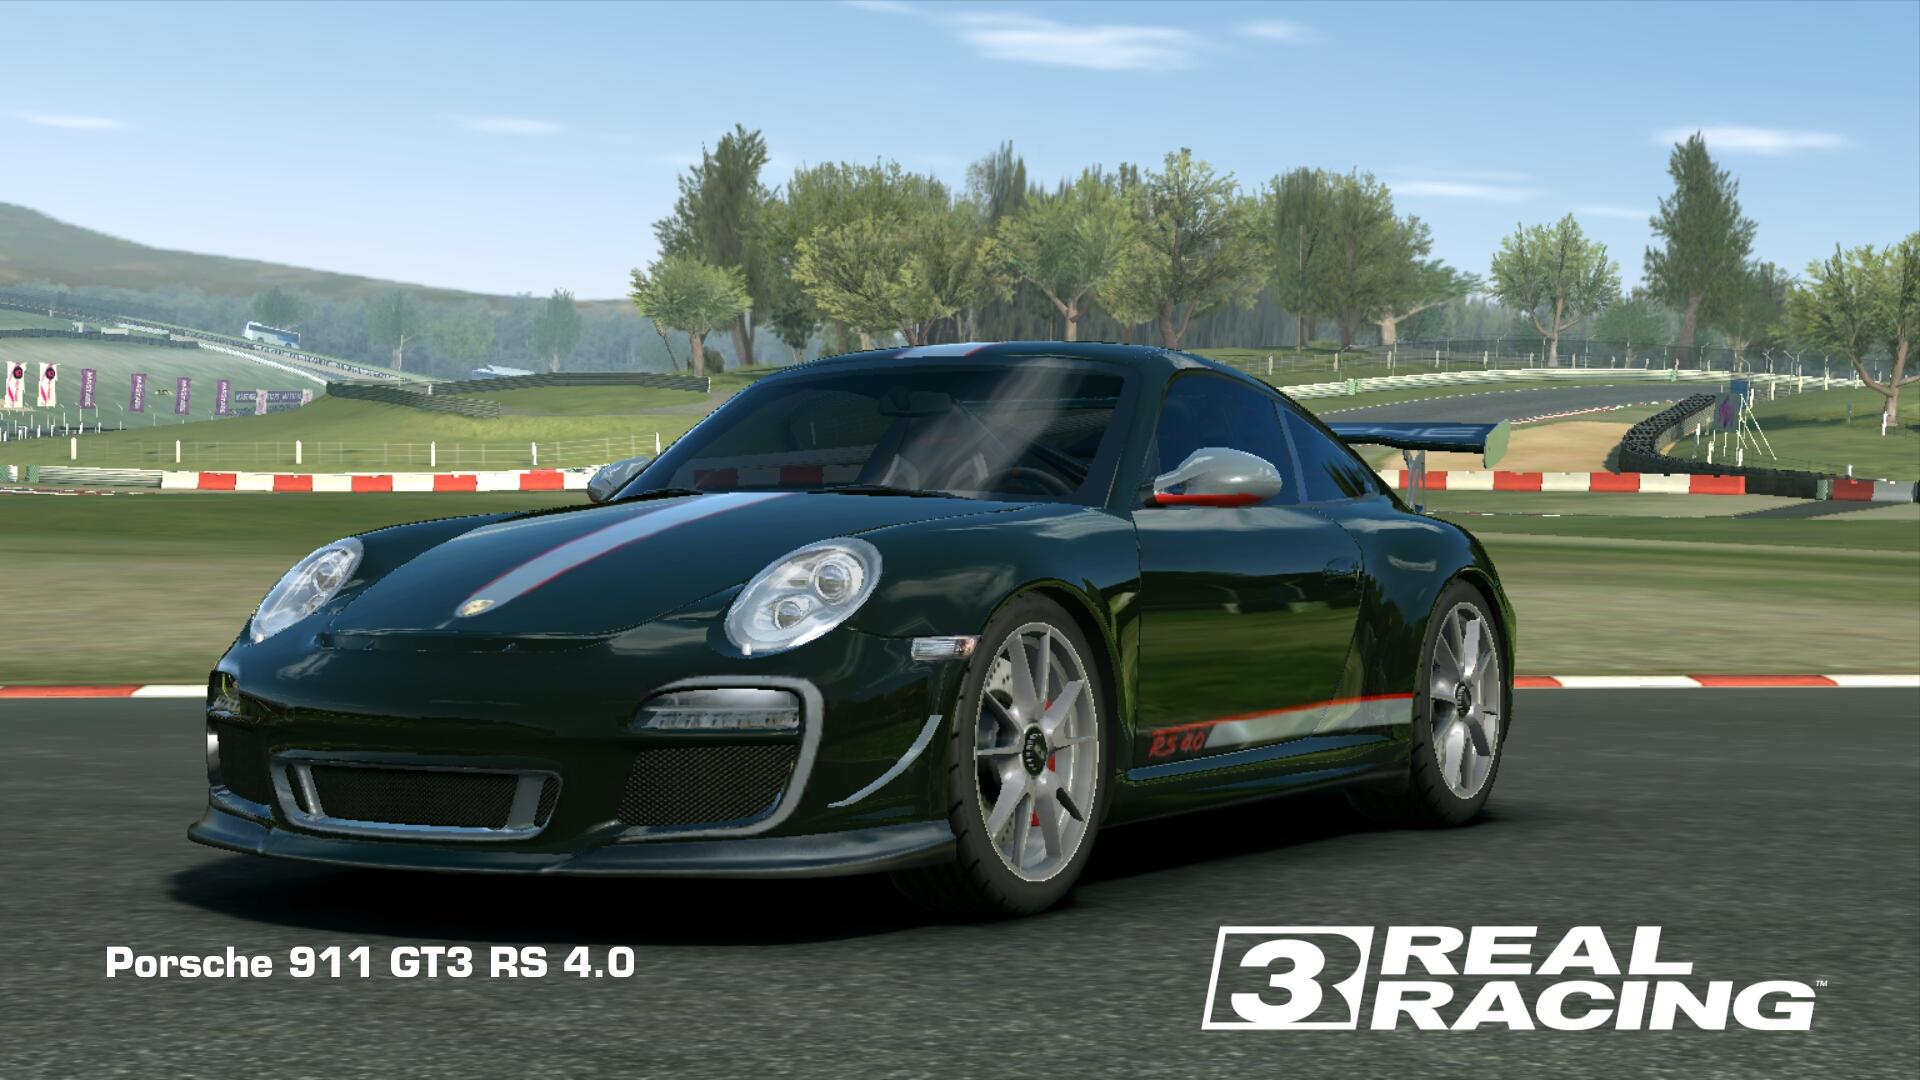 Image - Showcase Porsche 911 GT3 RS 4.0.jpg | Real Racing 3 Wiki ...